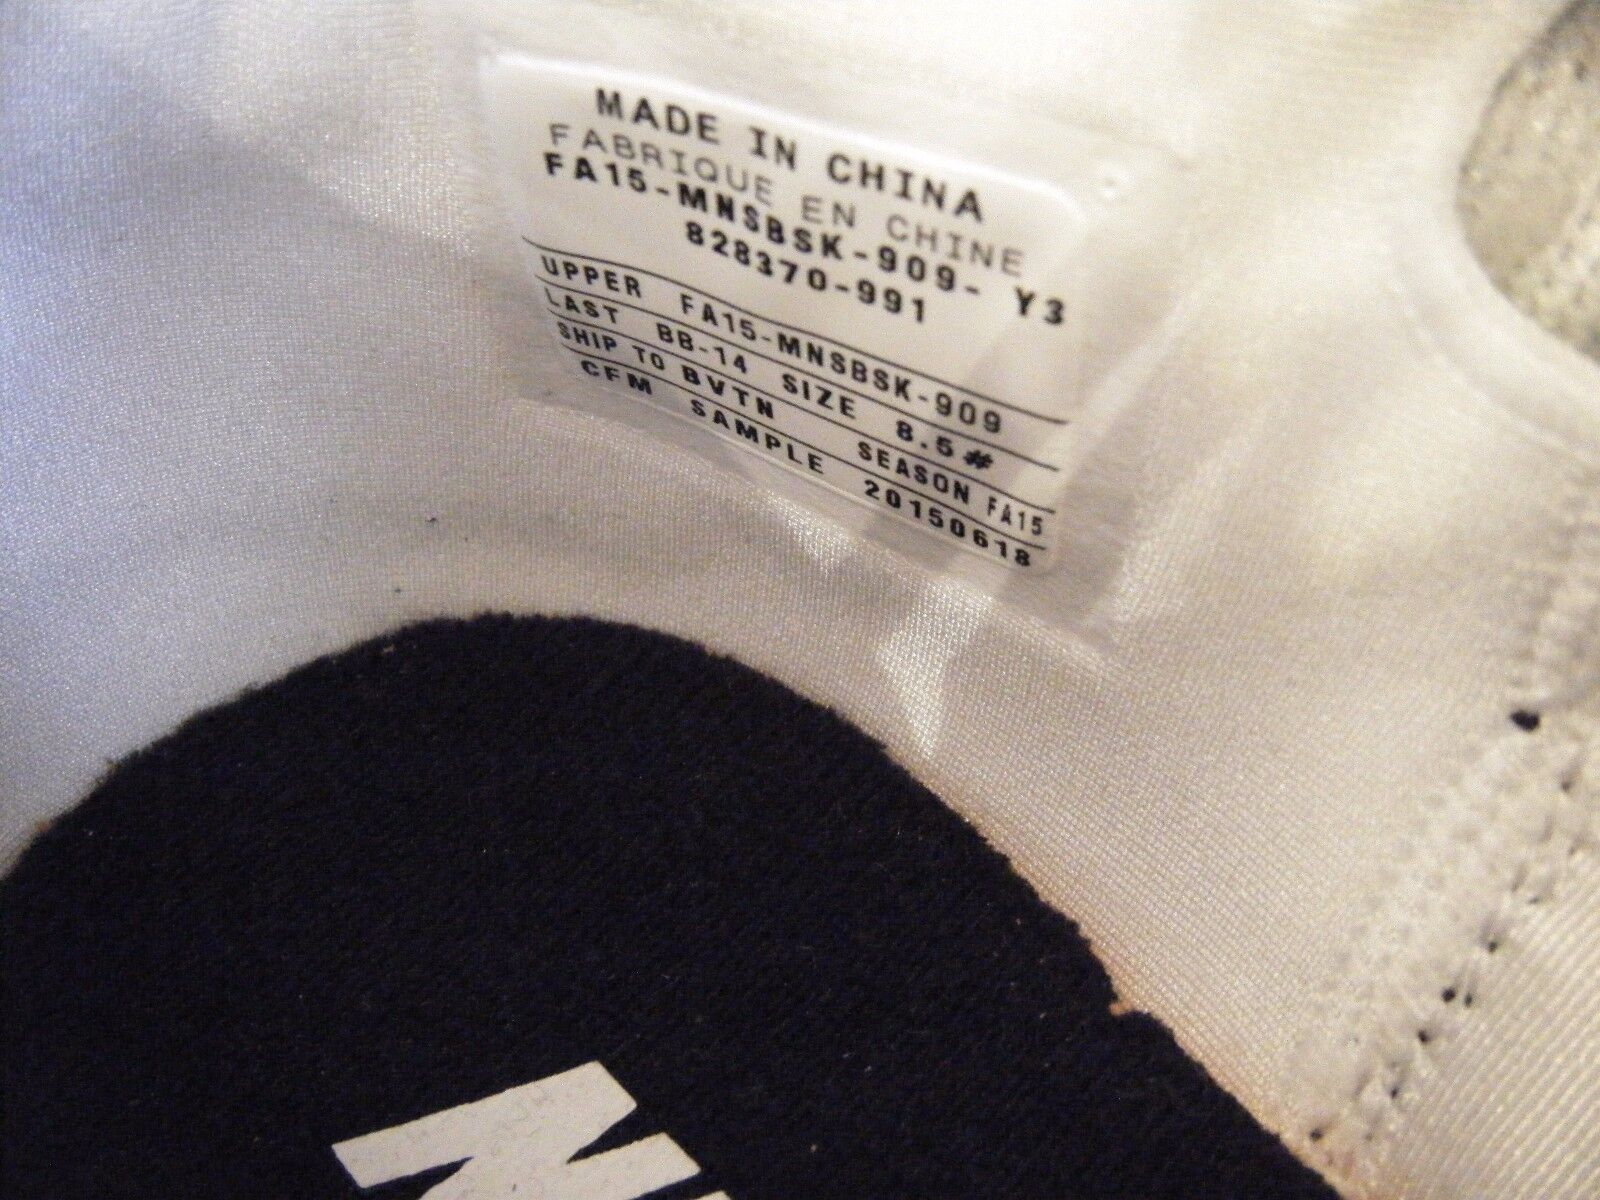 Nike zoom lebron xii 12 ext ext ext gomma città bianca pe promo campione id sz 8,5 cavs mvp | Uscita  | Scolaro/Signora Scarpa  58139c